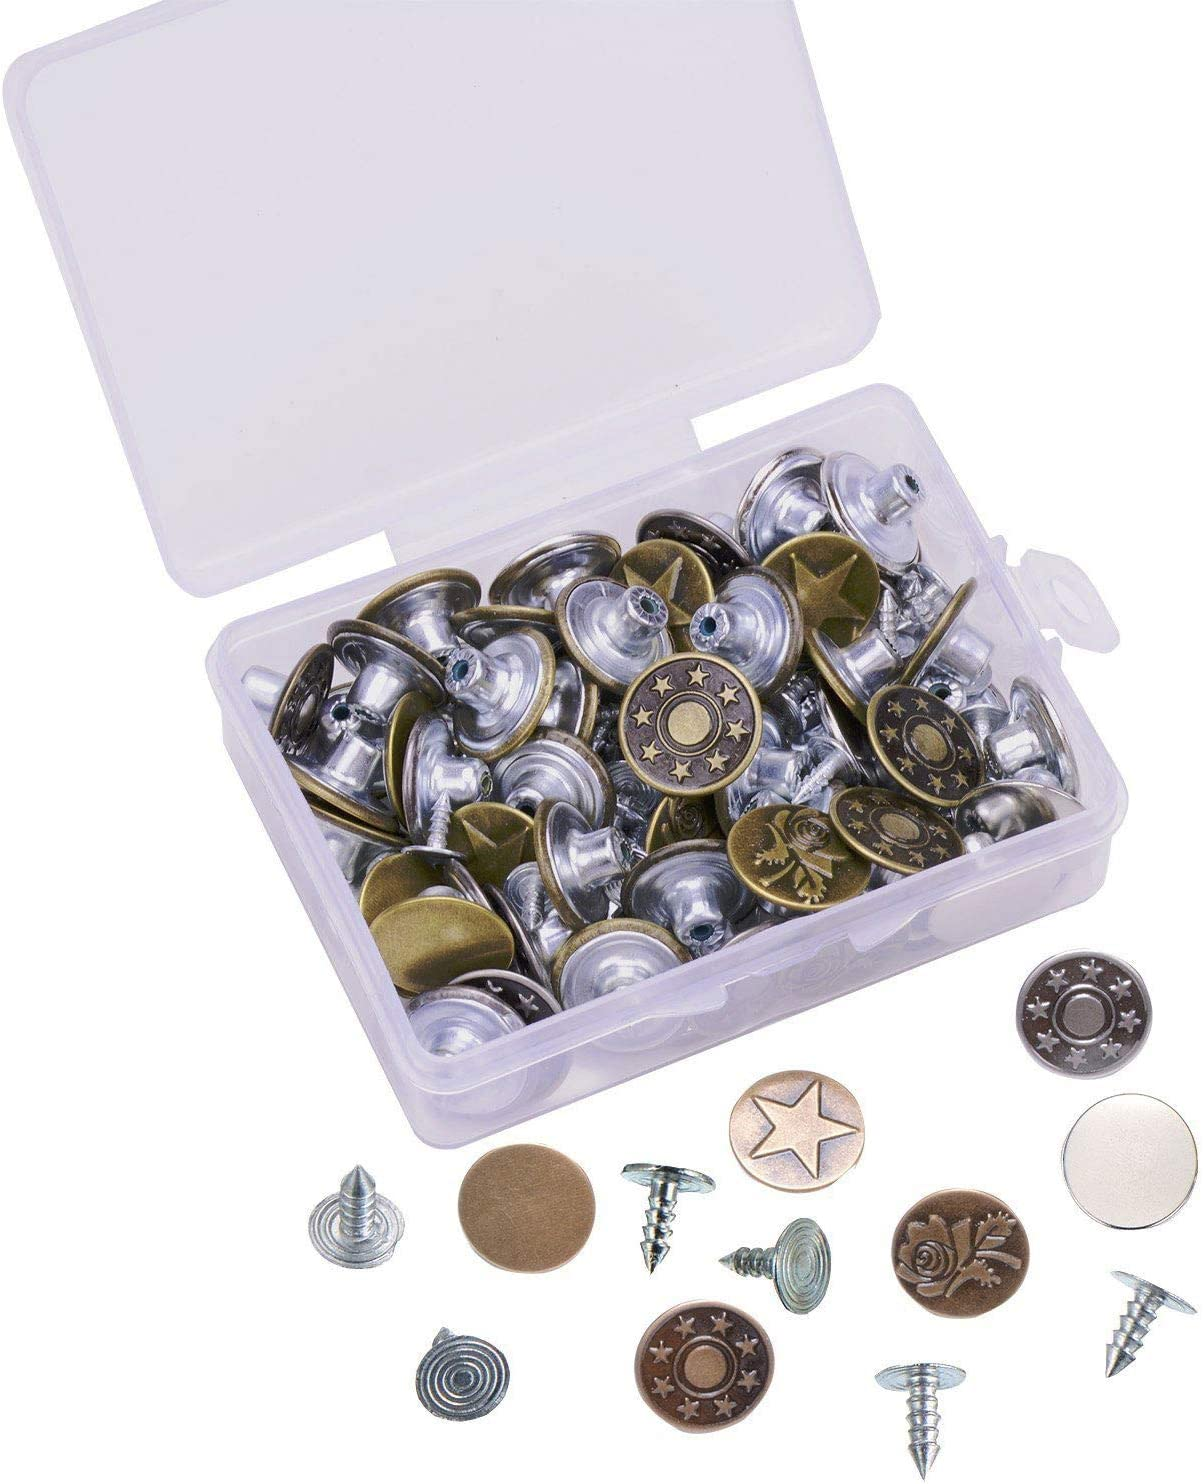 40 Set Metal Denim Jeans Tack Snap Stars Buttons Rivets Repair Replacement Box